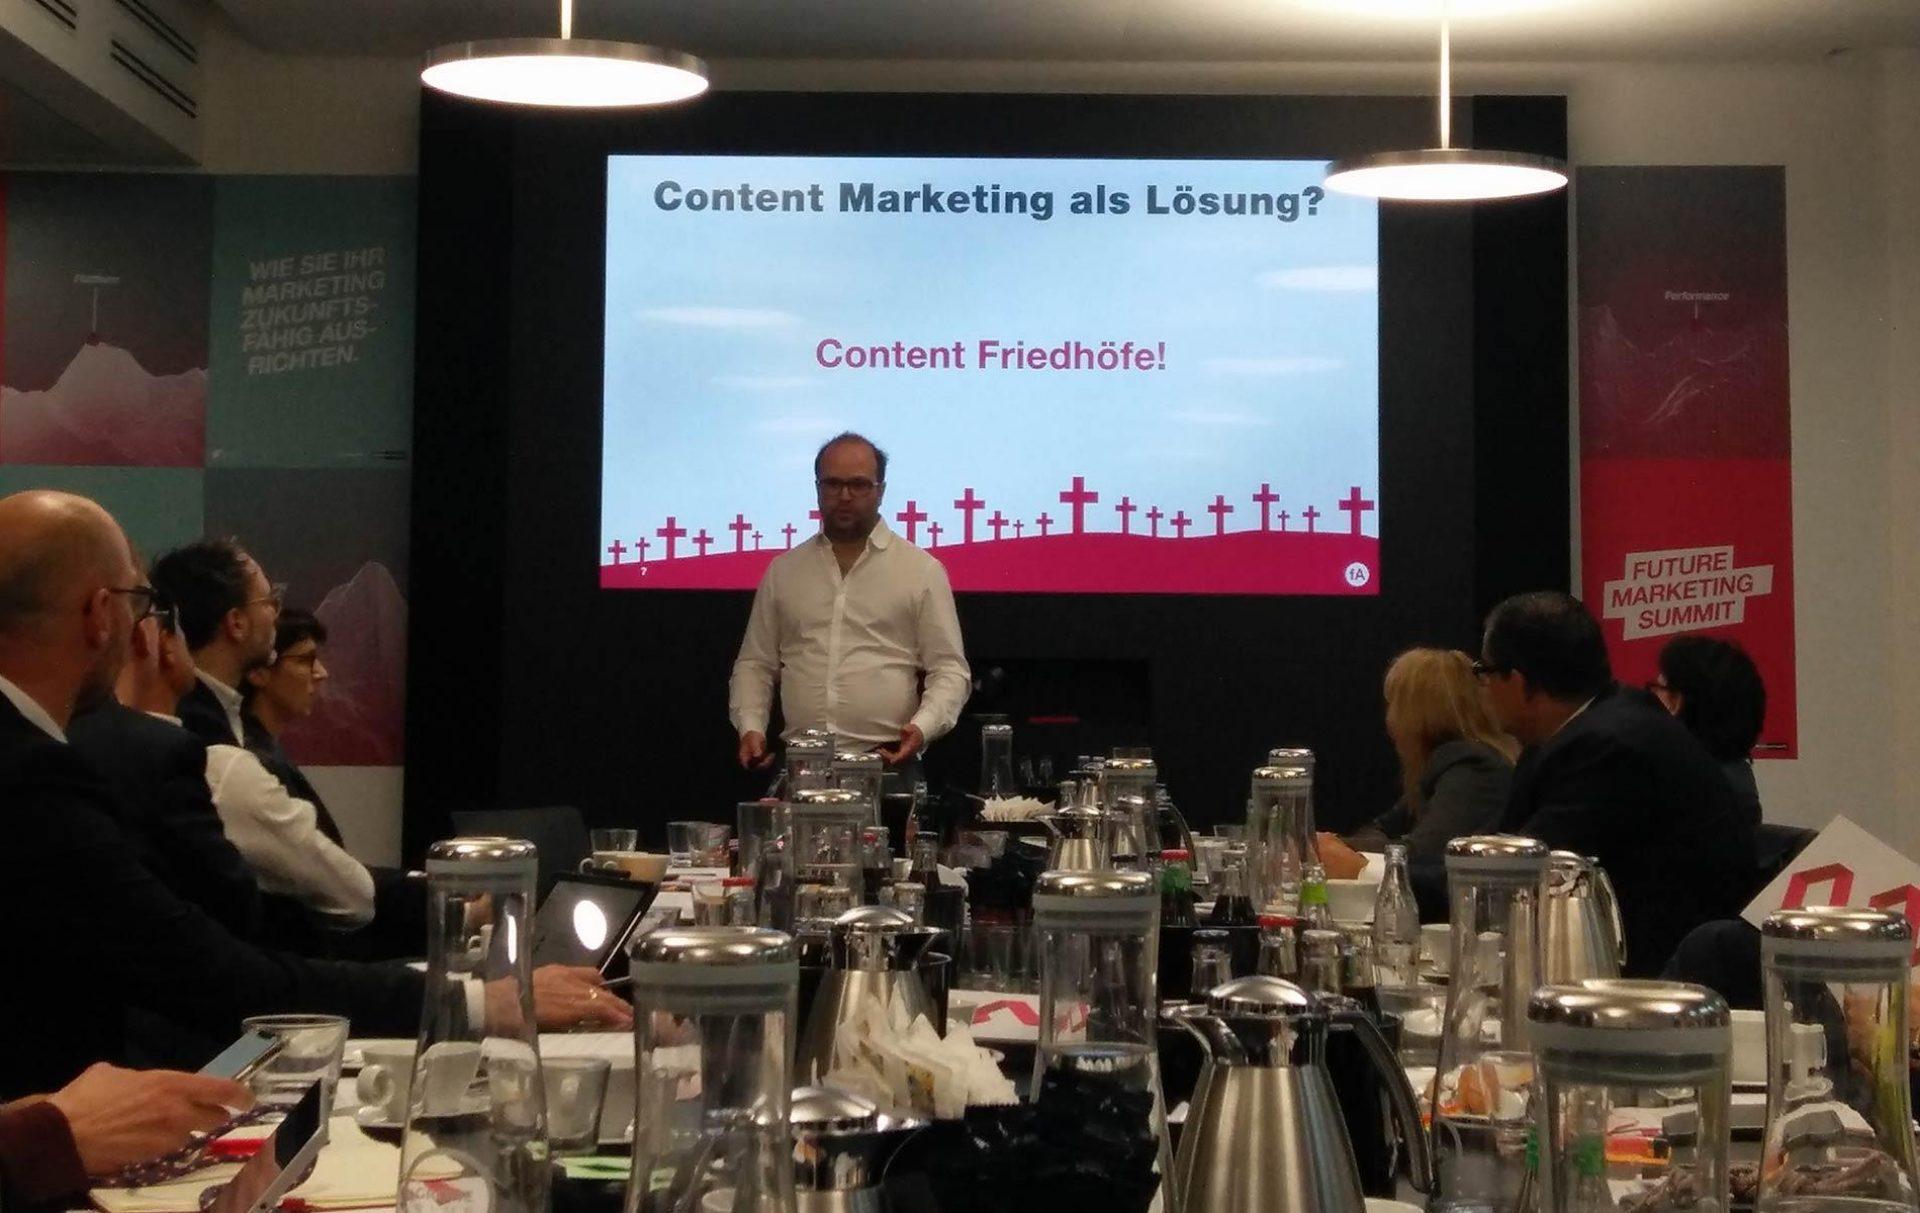 Fischerappelt future marketing summit Pascal Volz